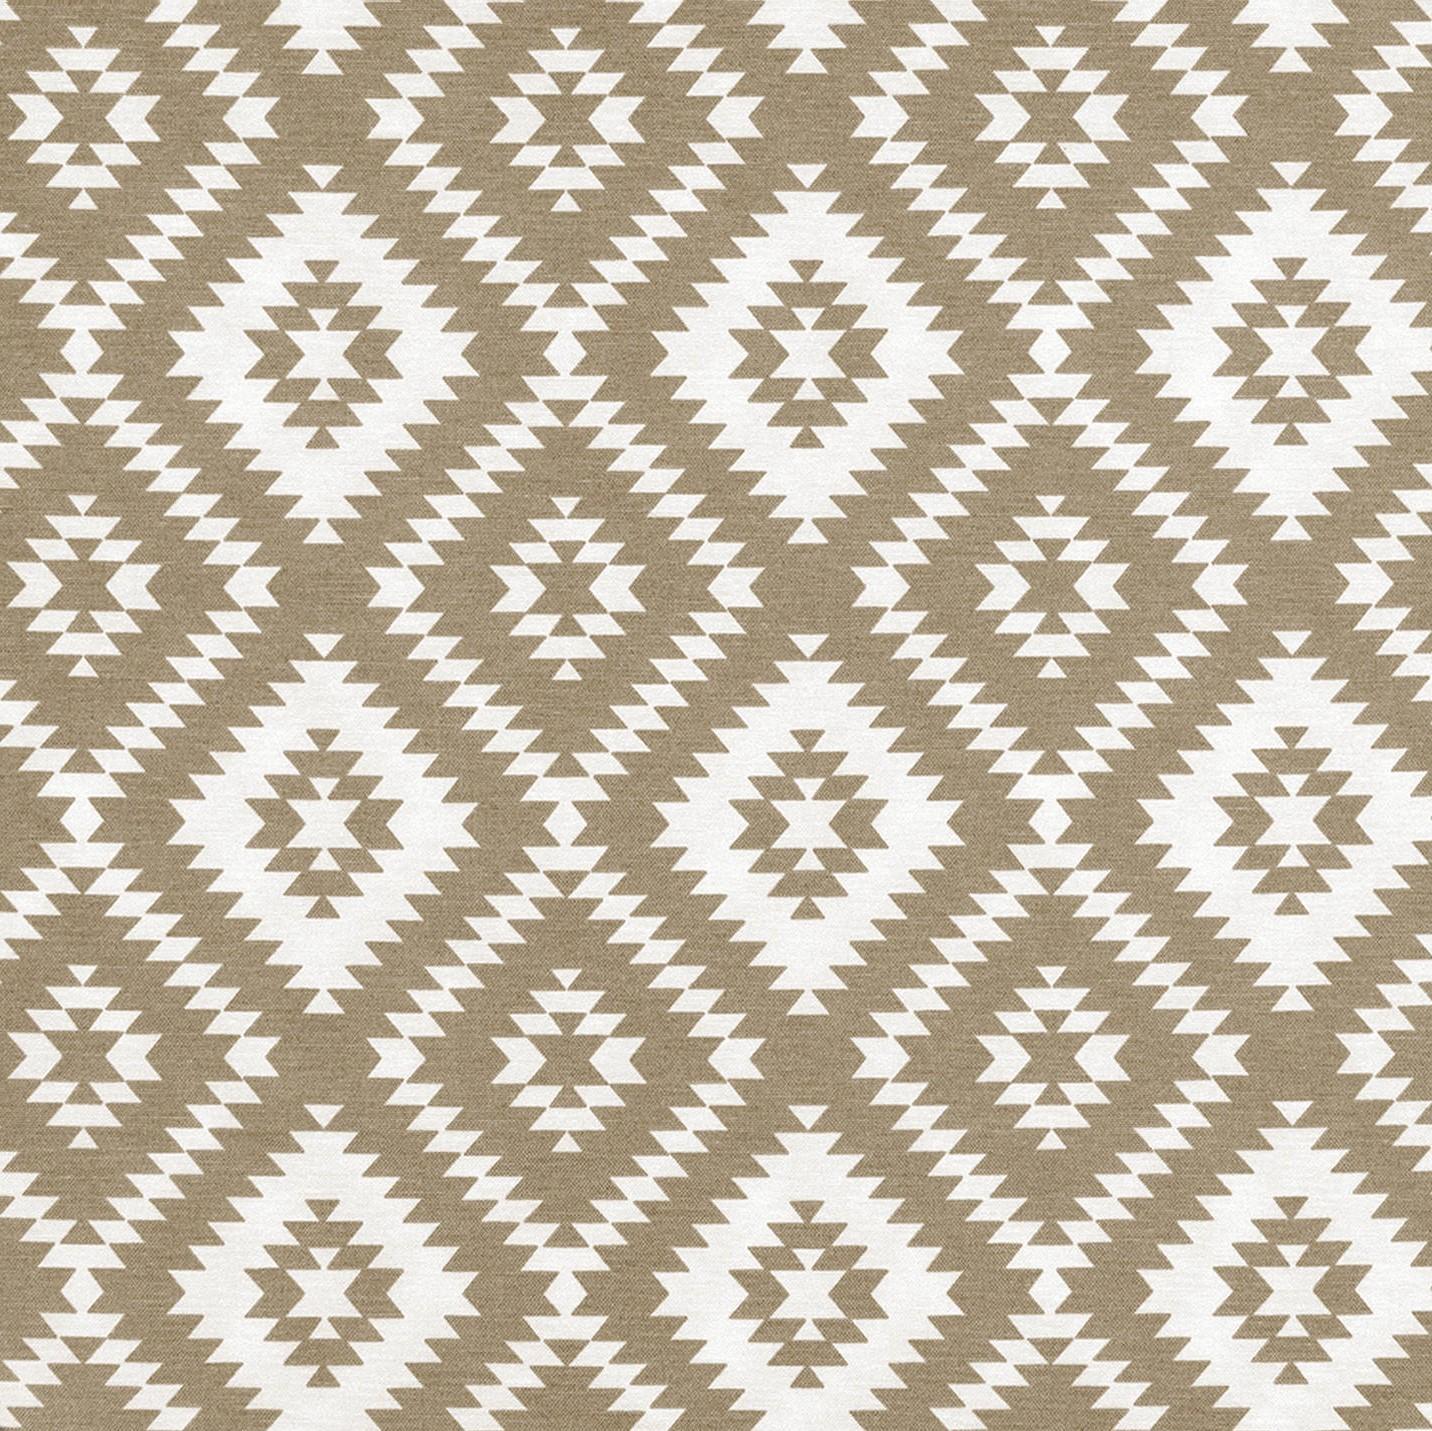 Mantel ÉTNICOBEIGE Rectangular 1,5x2,1m [enstockpara envíooretiro]